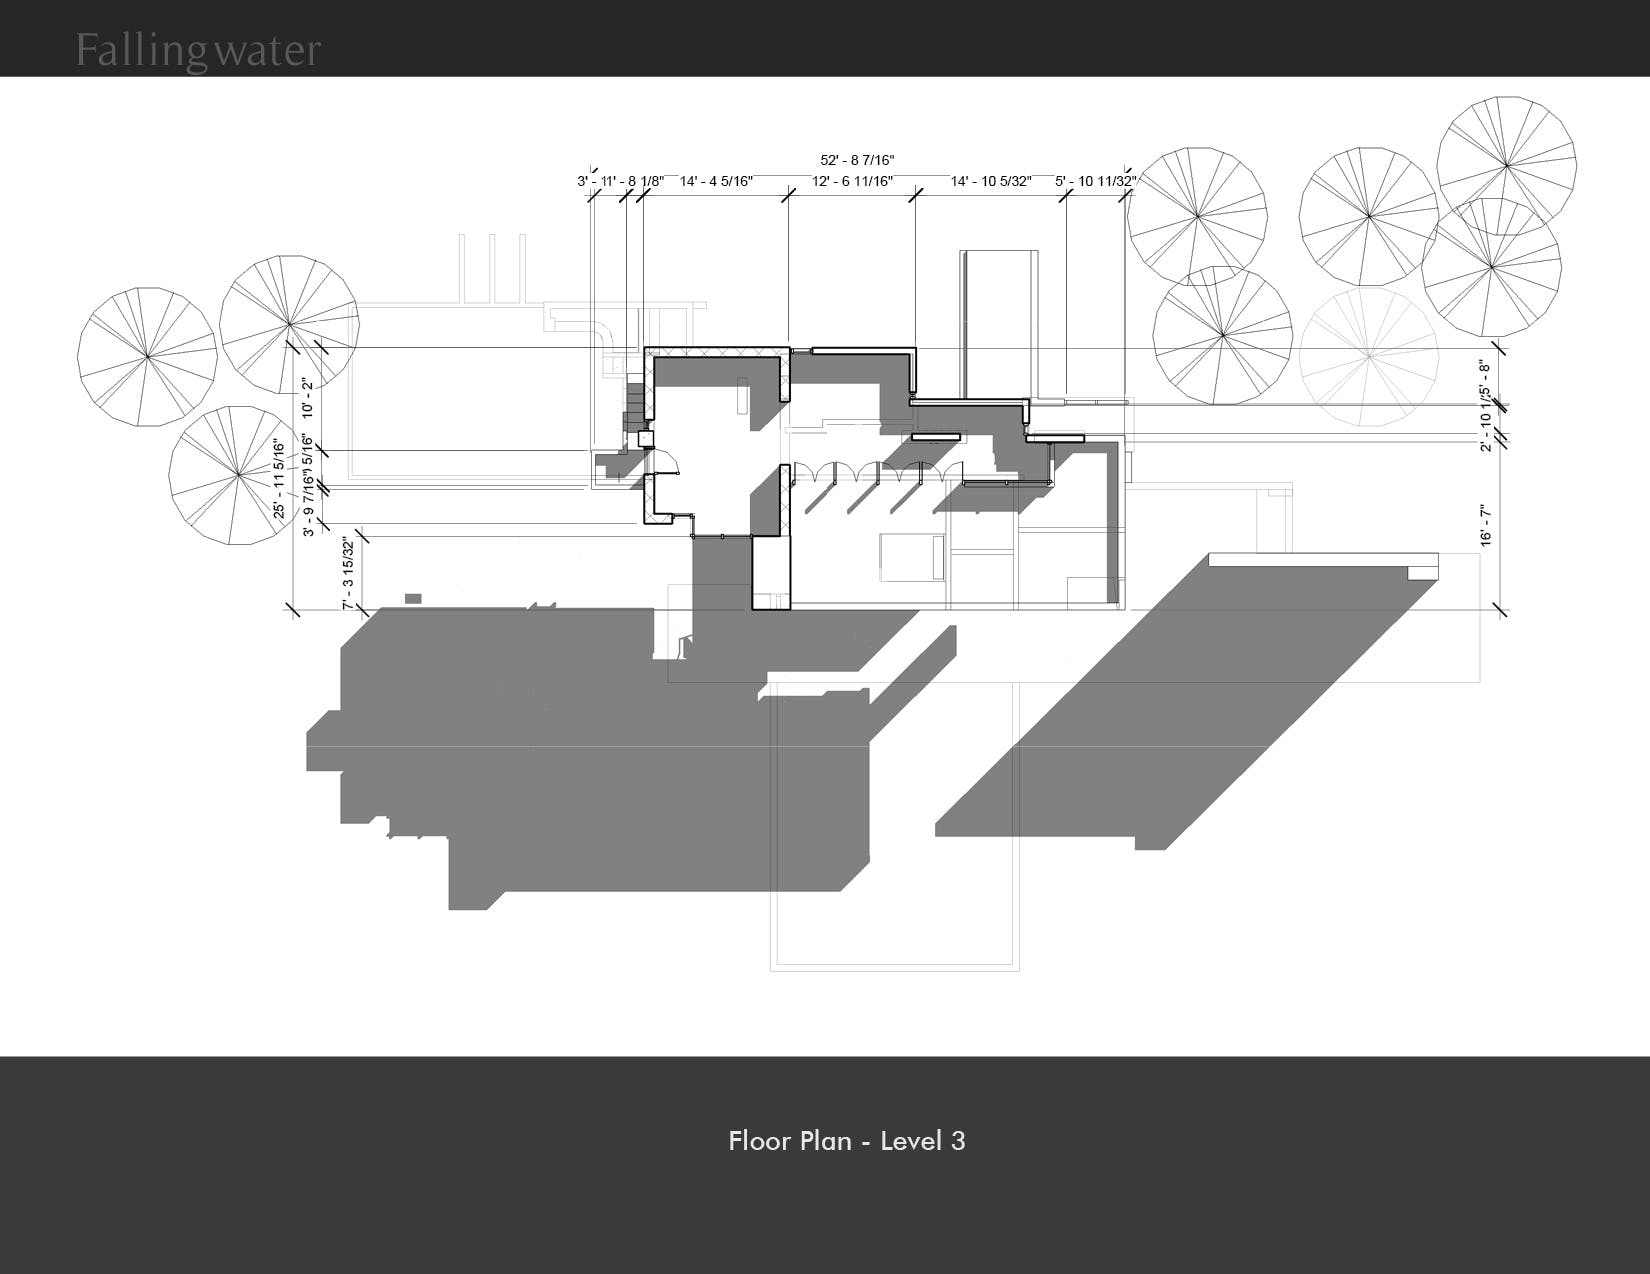 Falling Water Floor Plan Pdf Fallingwater House Juliana Cervera Archinect